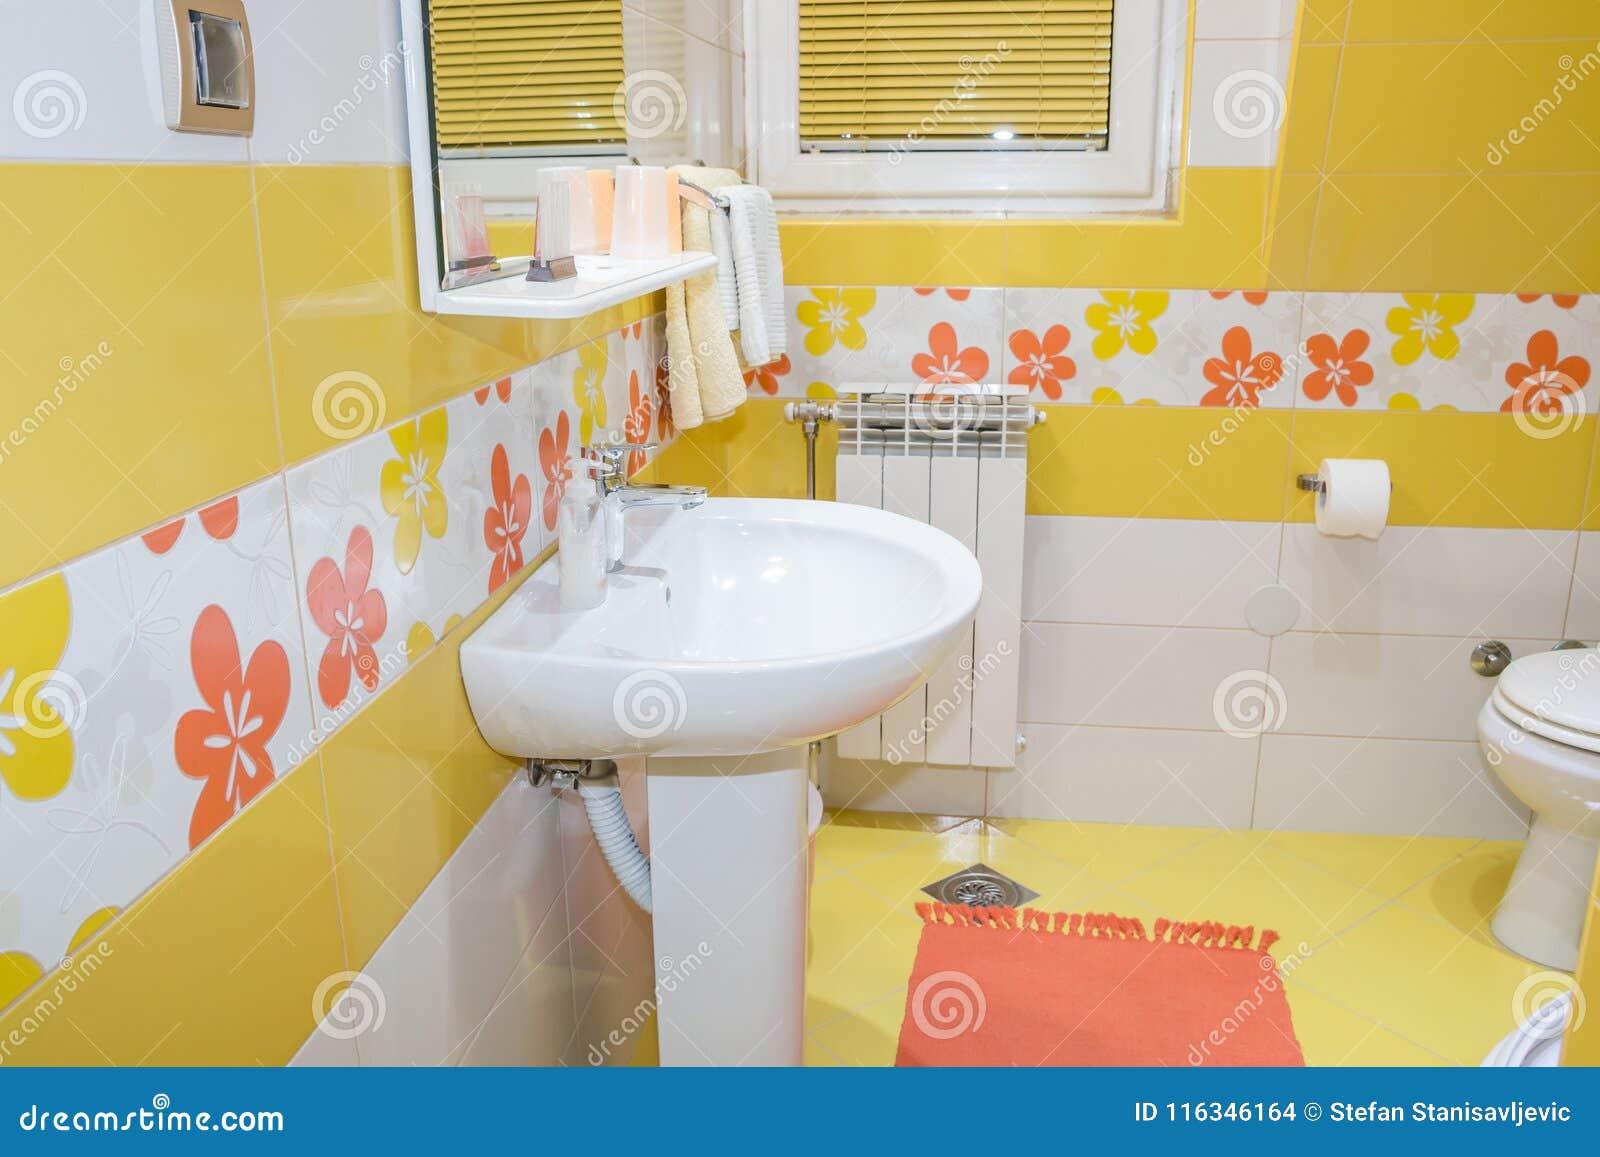 Yellow Bathroom Interior Stock Photo Image Of Blinds 116346164 Download yellow bathroom decorating